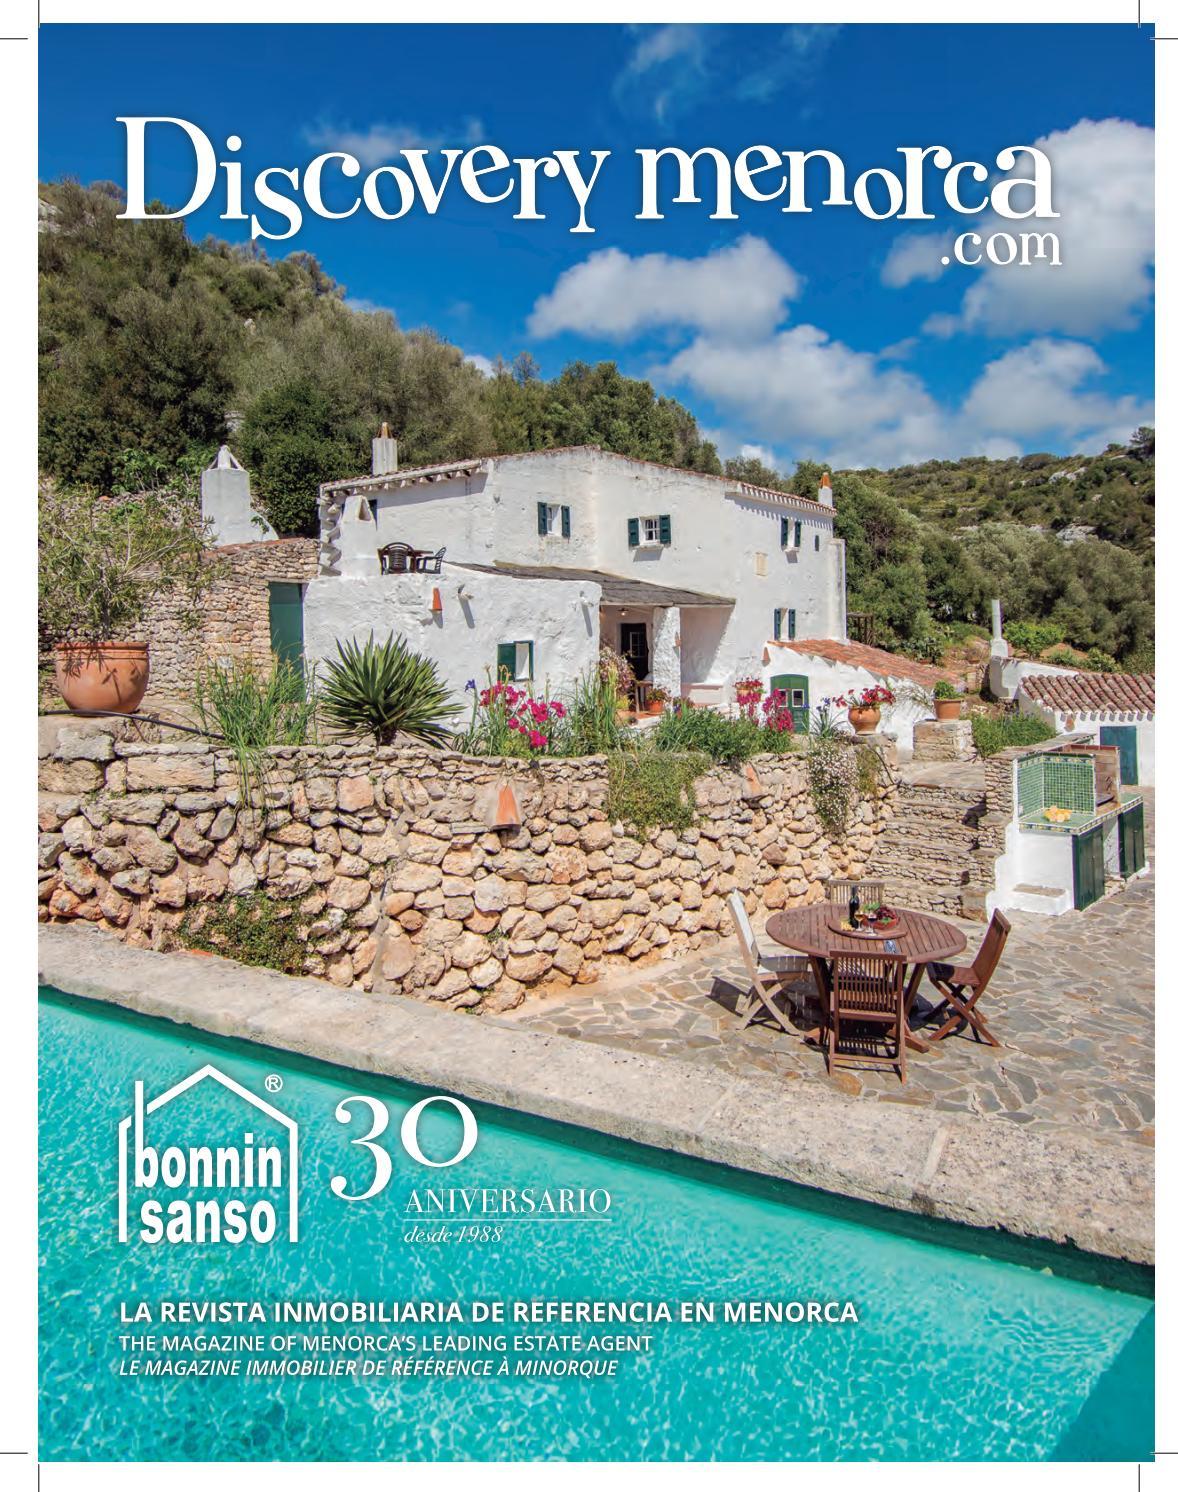 Discovery menorca 2018 1 by bonnin sanso estate agents - Bonnin sanso menorca ...